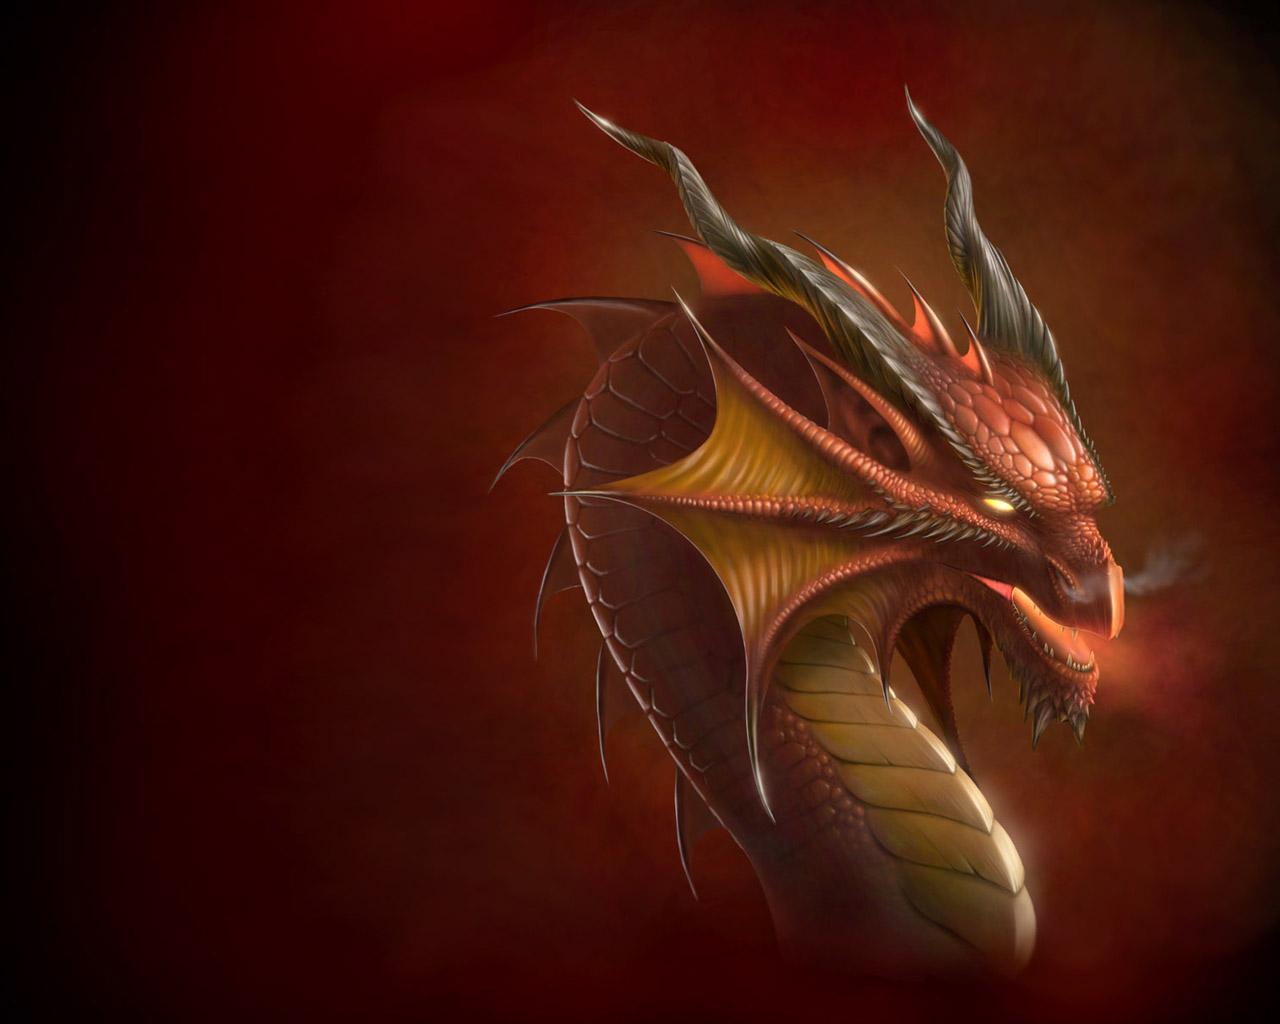 http://3.bp.blogspot.com/_69ovQpZVdFw/TUwjerLmzFI/AAAAAAAAB8I/0kQKD-VHUQk/s1600/Dragon_head_Wallpaper.jpg